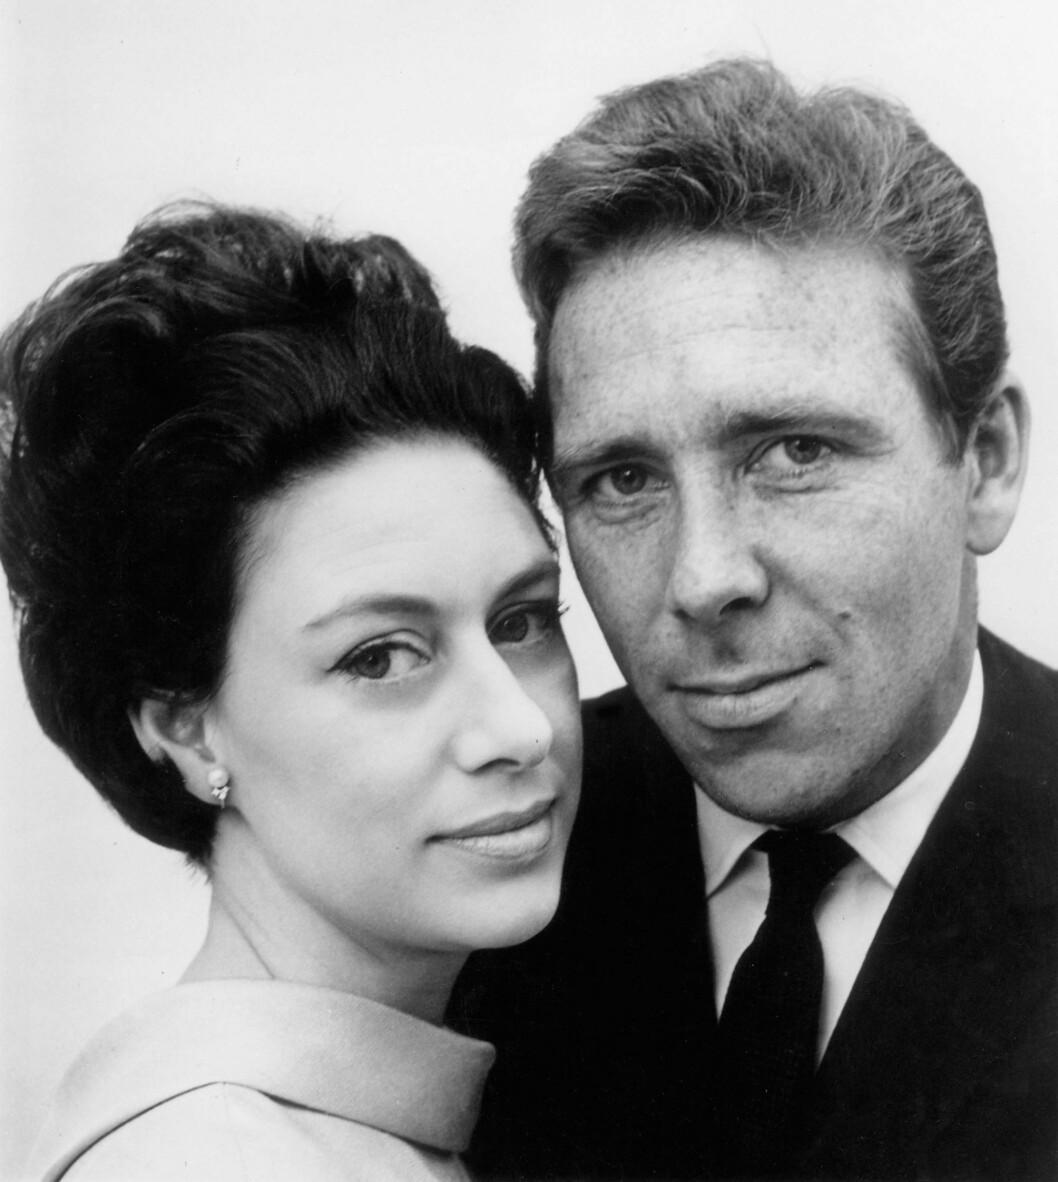 <strong>PENT PAR:</strong> Prinsesse Margaret møtte fotografen Antony Armstrong-Jones under en middag i 1958 - året etter tok han bilder av henne i forbindelse med 29-årsdagen. Foto: NTB Scanpix